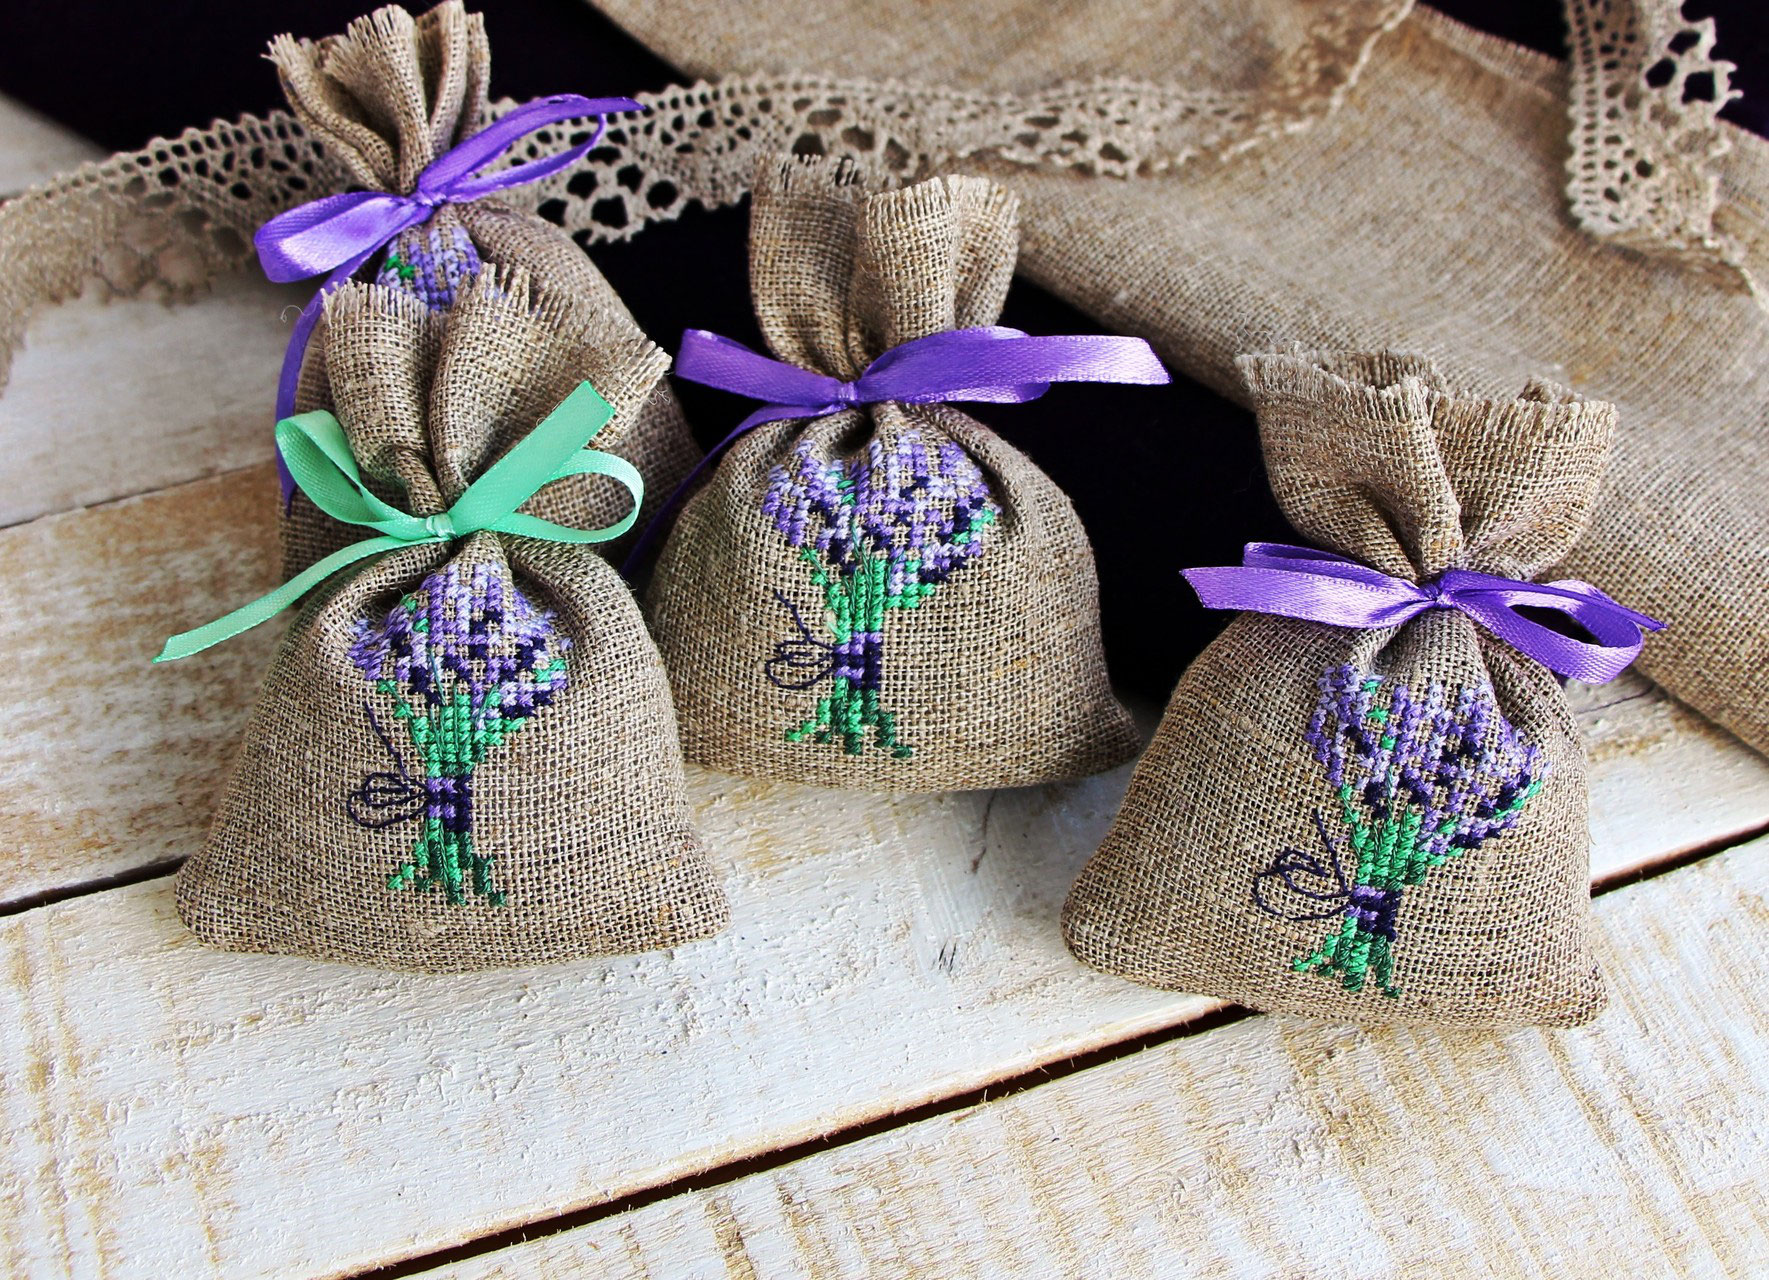 Ароматические саше - мешочки с травами